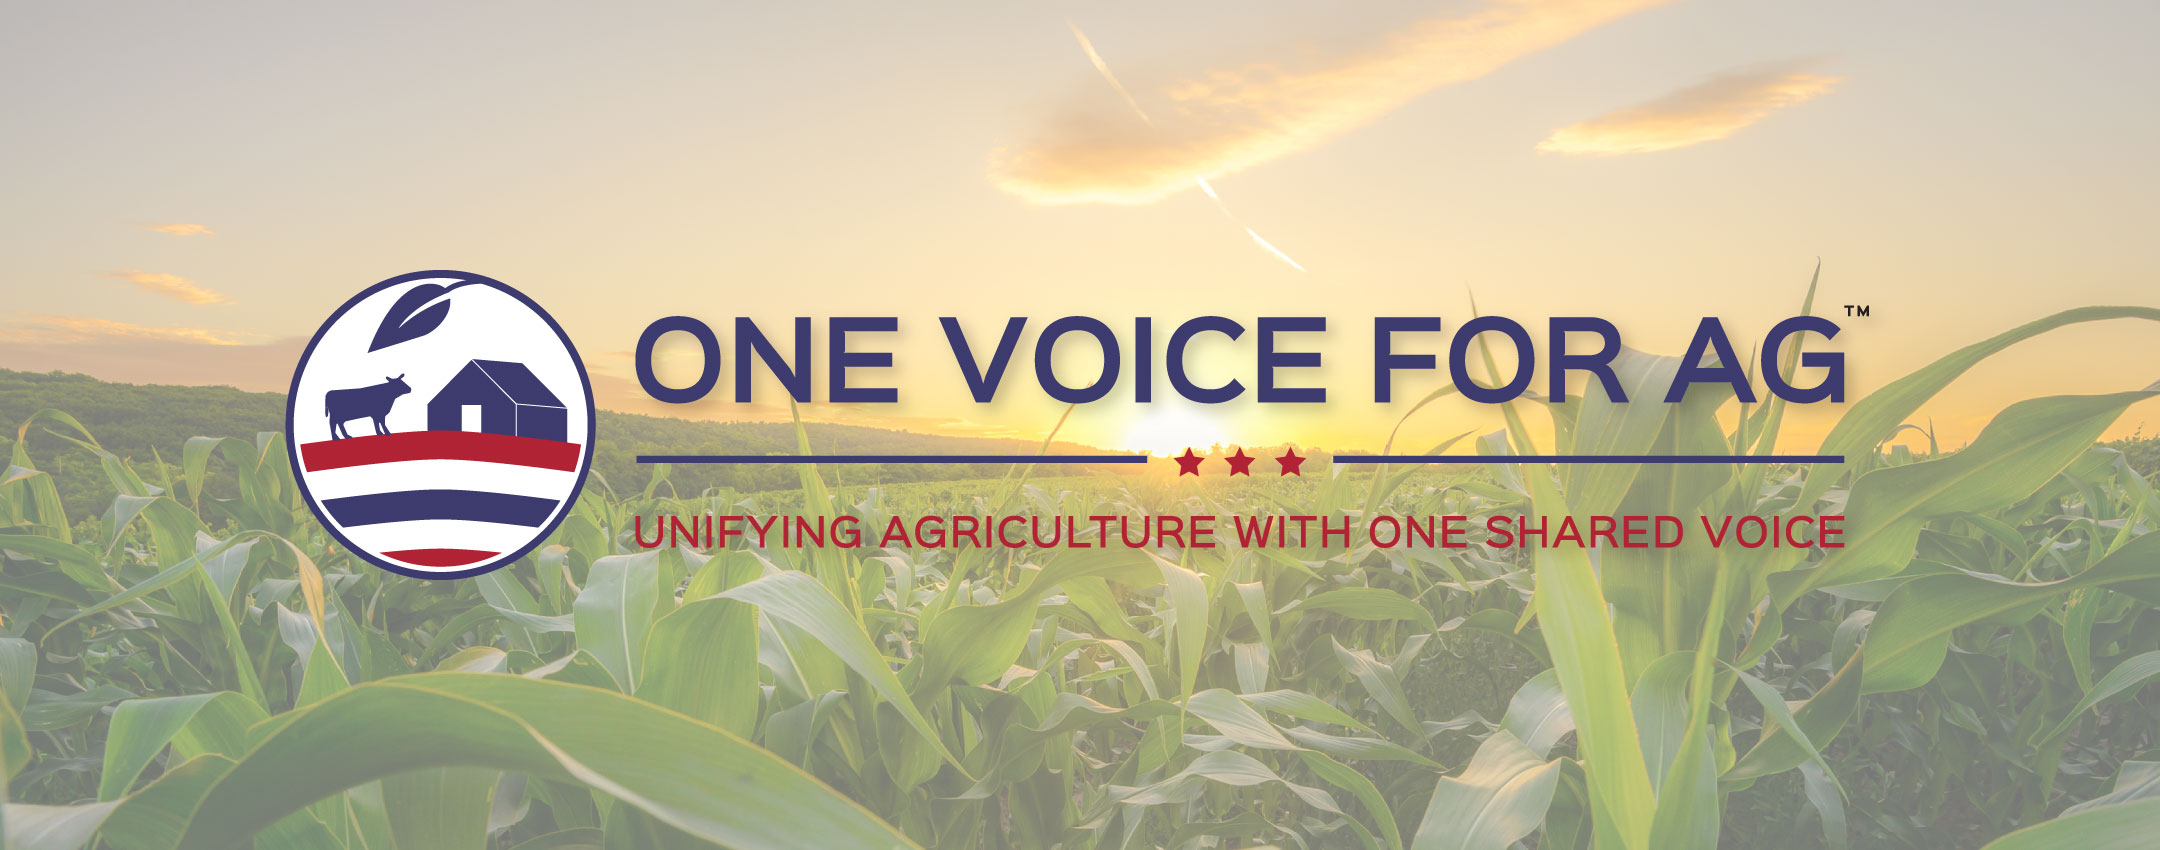 OVFA Banner Image